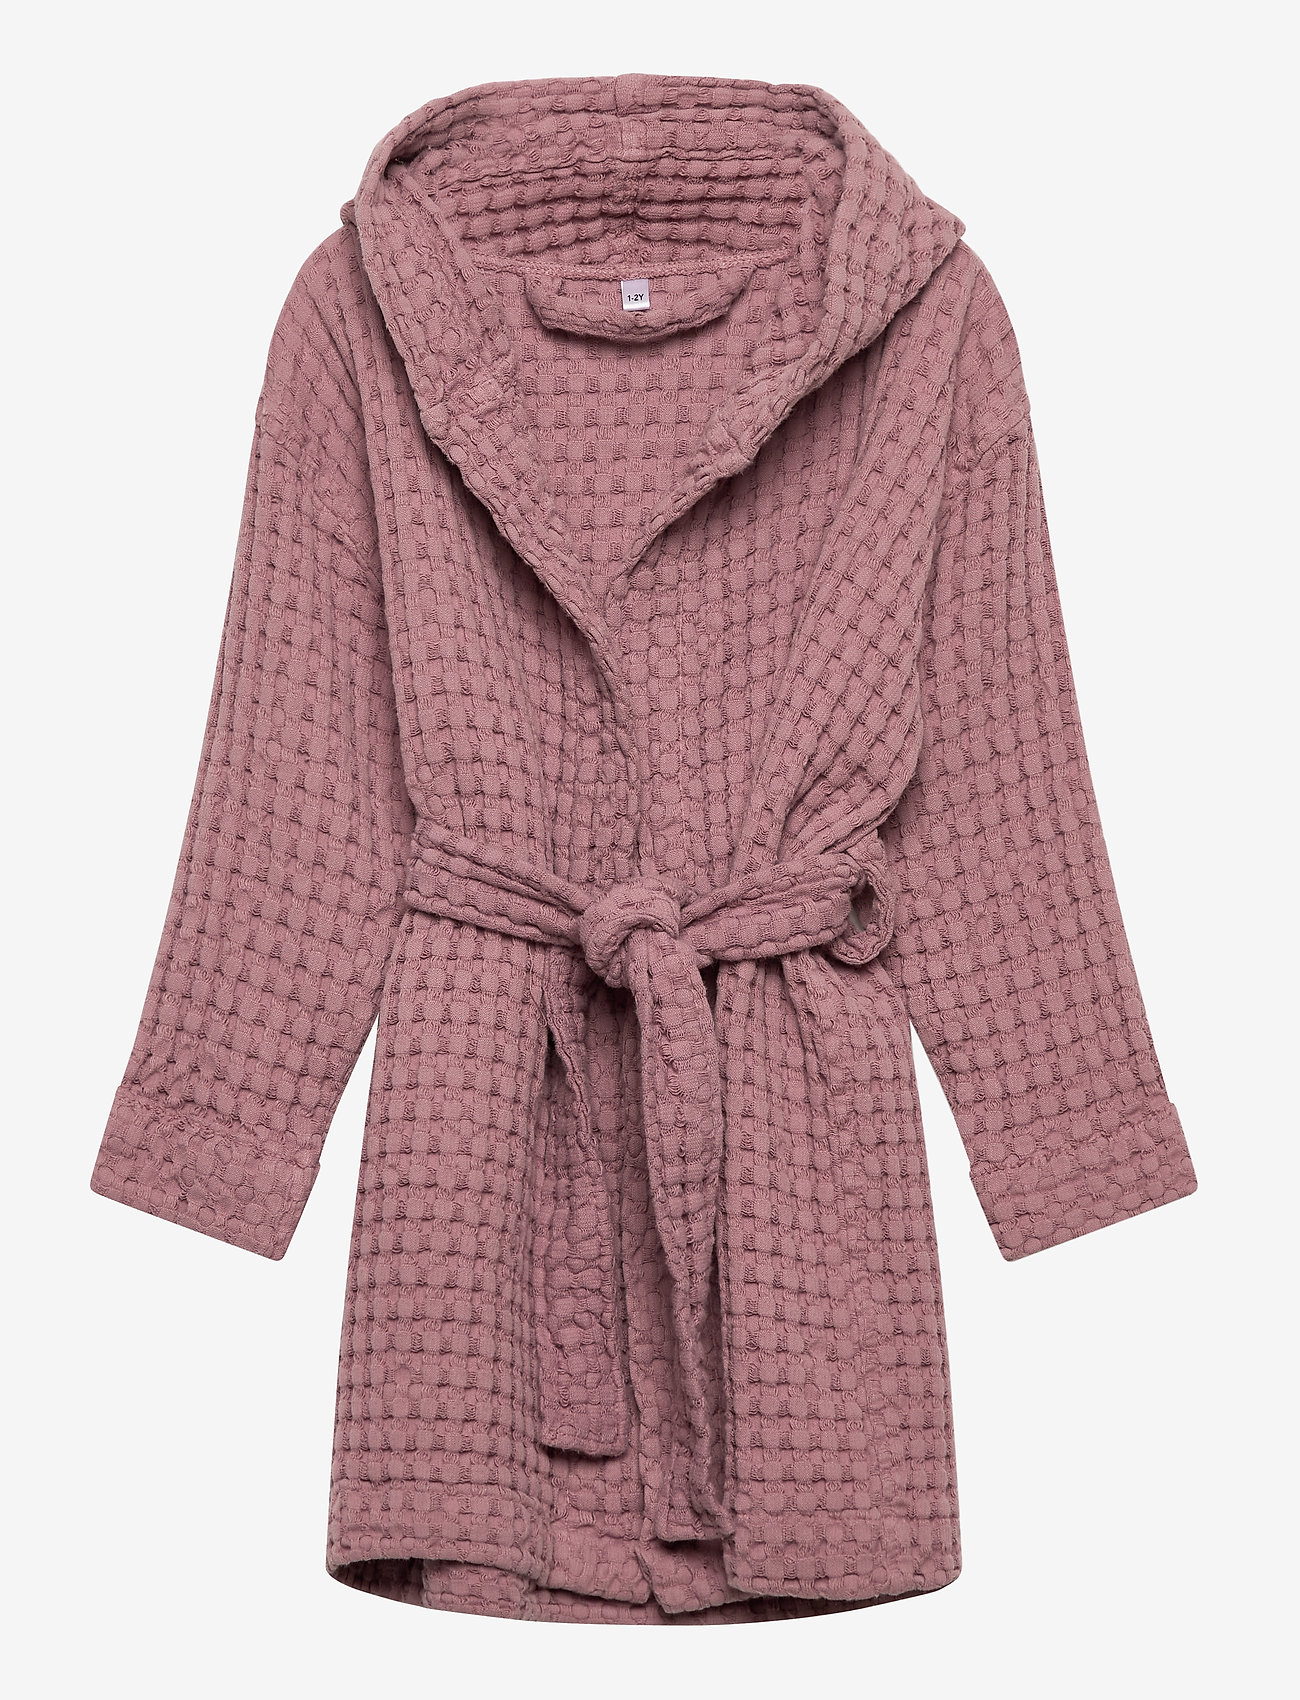 Cozy by Dozy - Cozy by Dozy Bath Robe - bathrobes - pink - 0